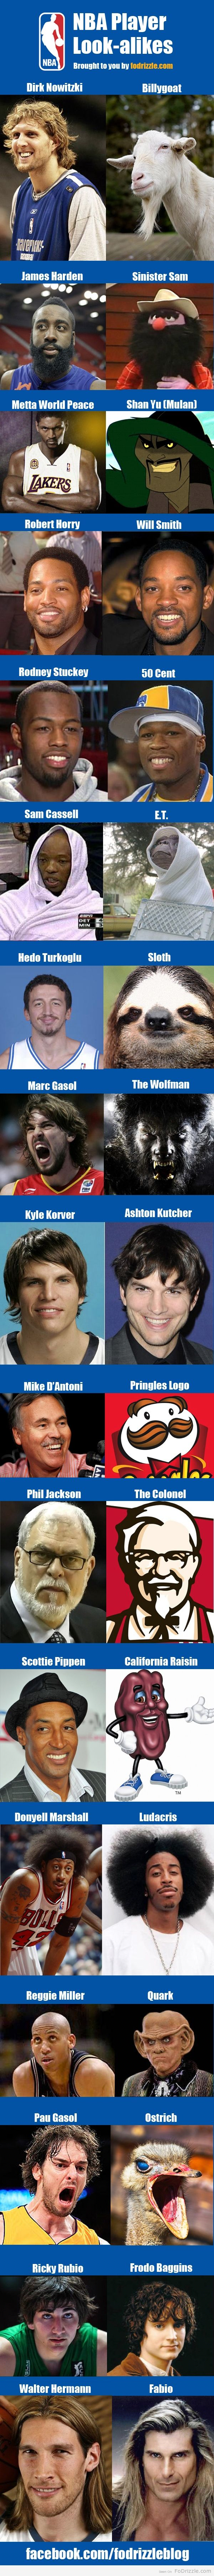 NBA Look-alikes